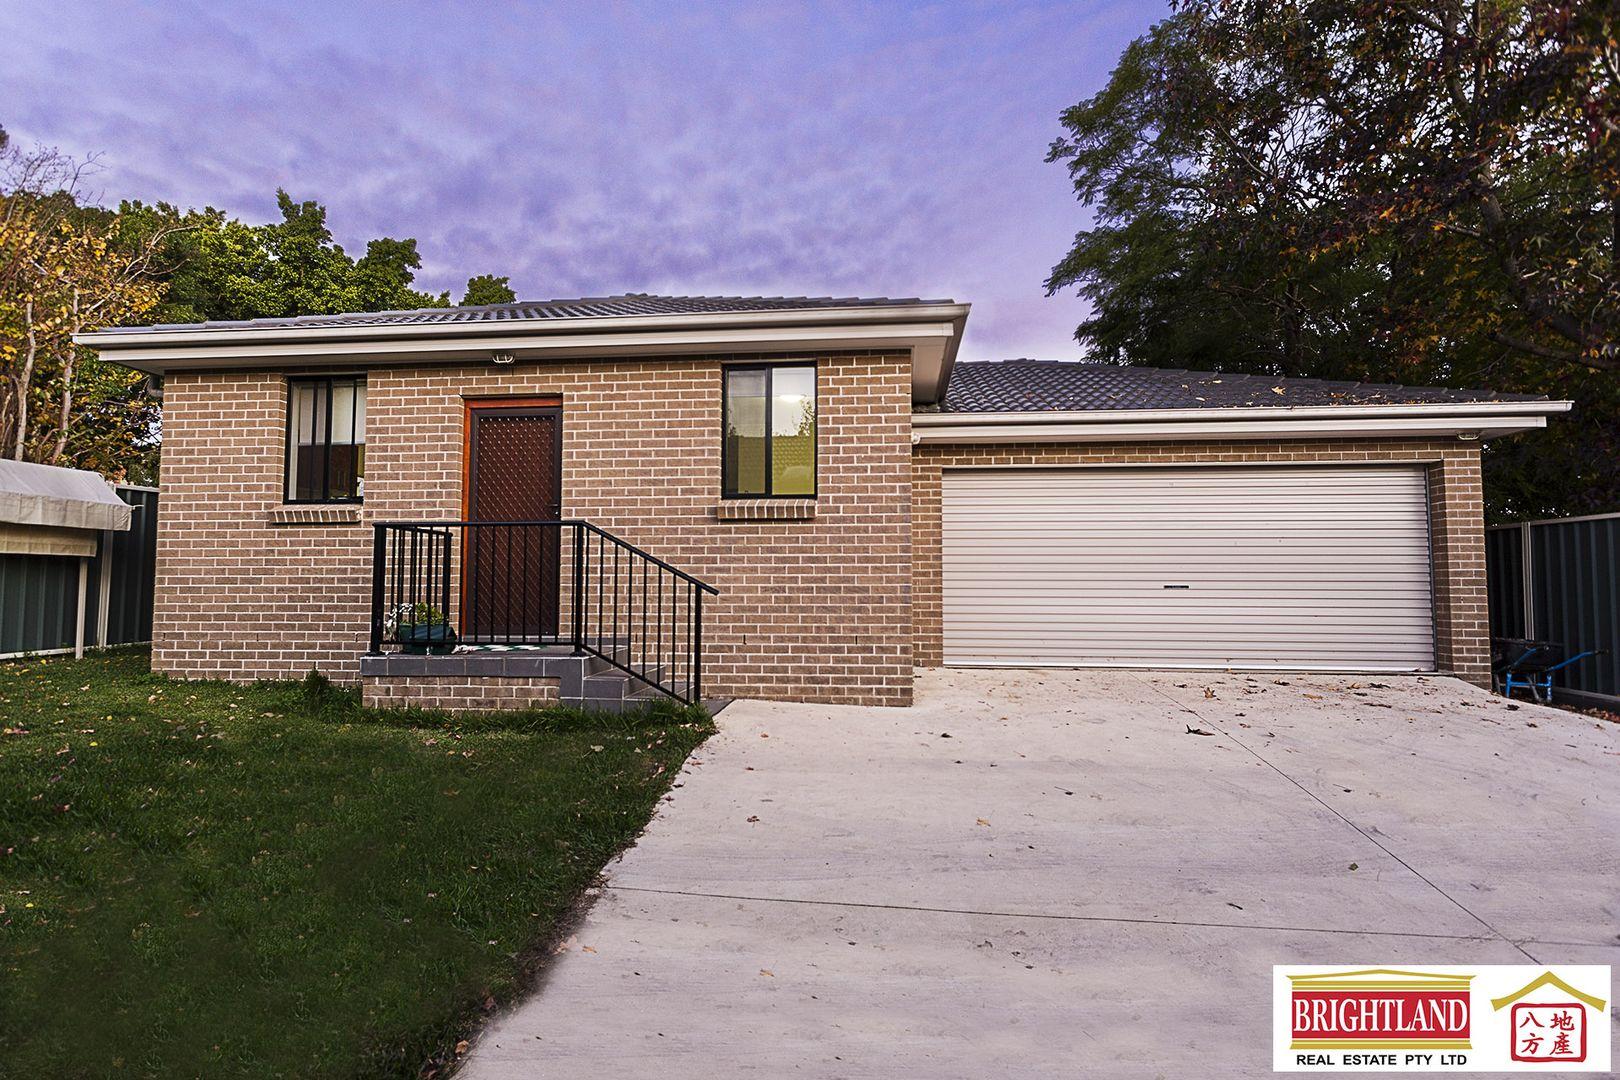 19A Brown St, North Parramatta NSW 2151, Image 0